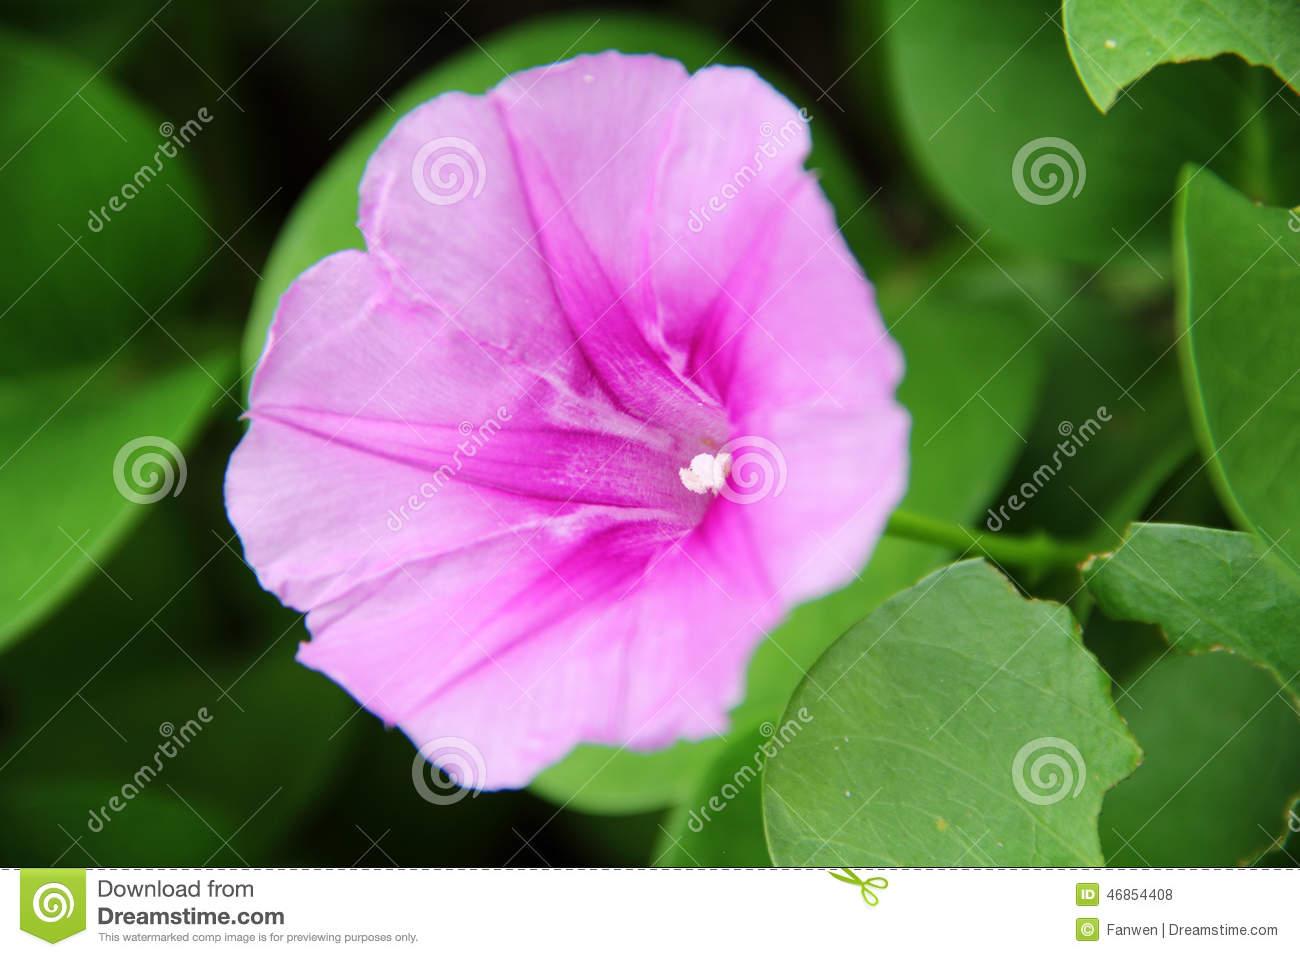 Simple Natural Beautiful Flowers